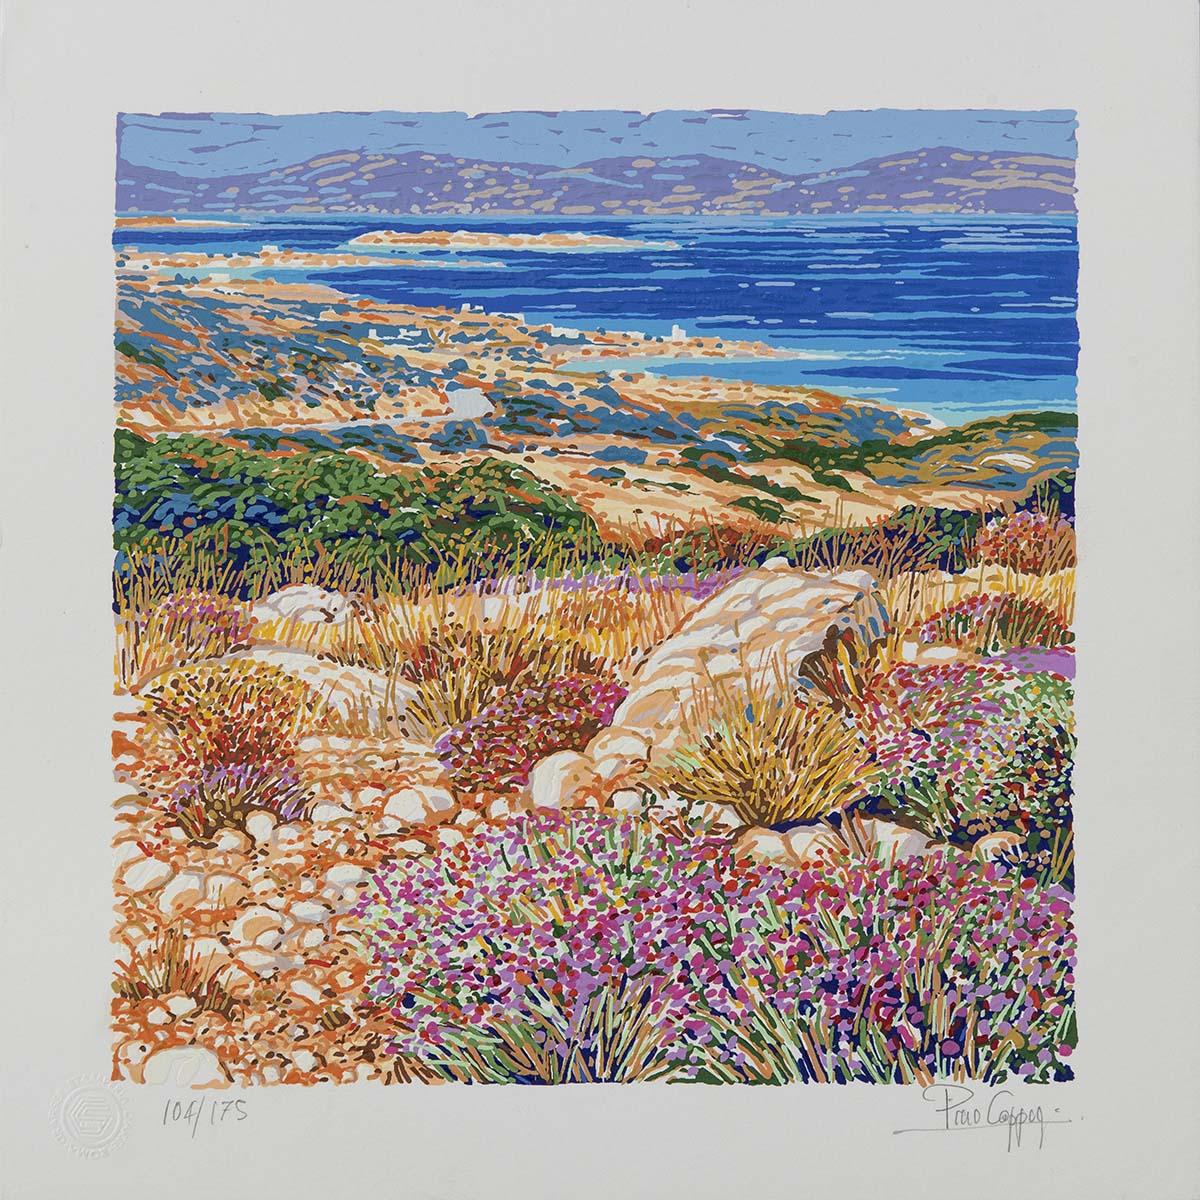 Pino Cappugi - Panorama a Paros - Serigrafia polimaterica 25x25cm